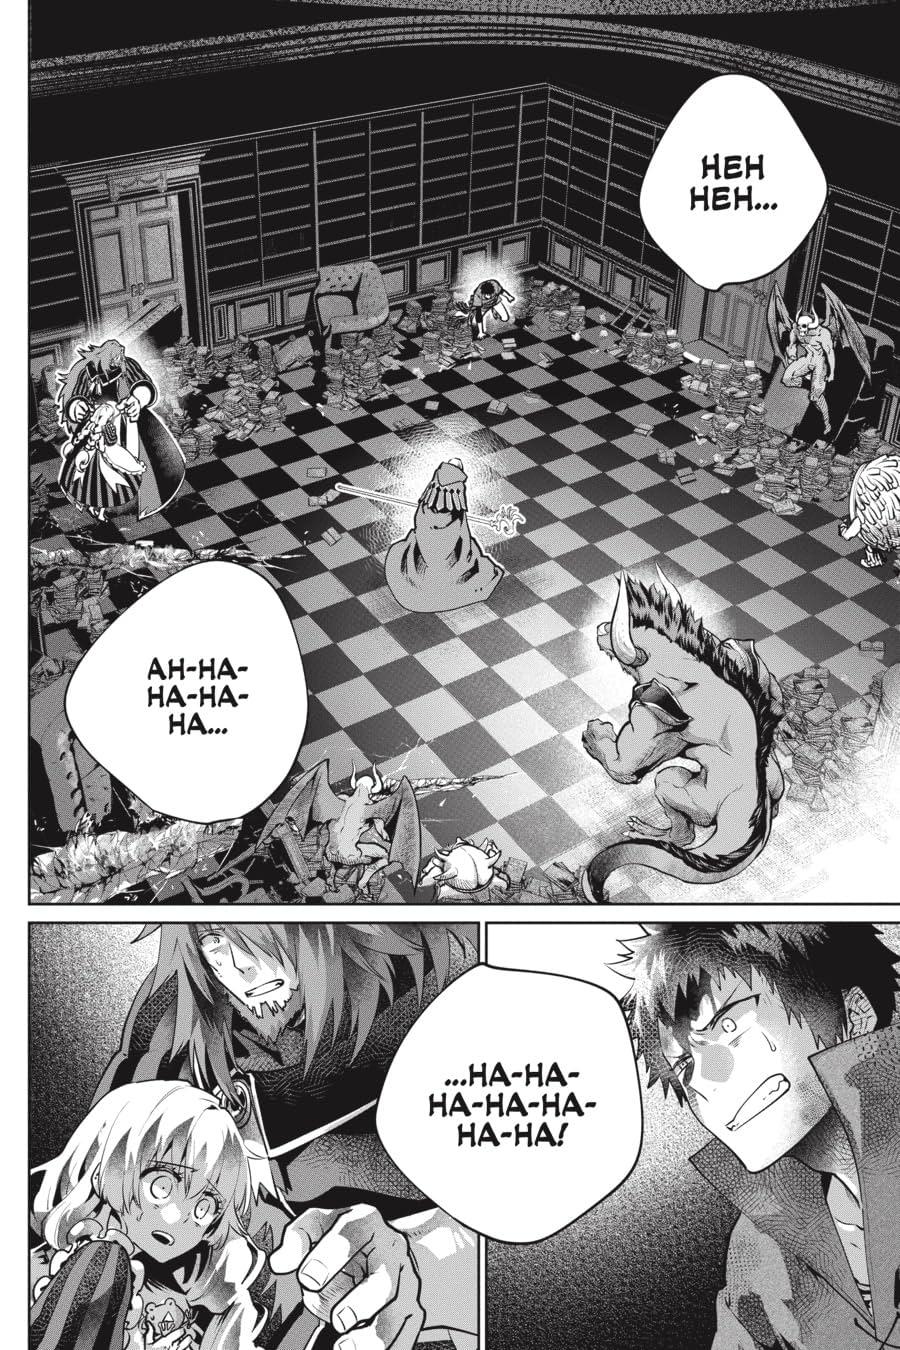 Final Fantasy Lost Stranger #27